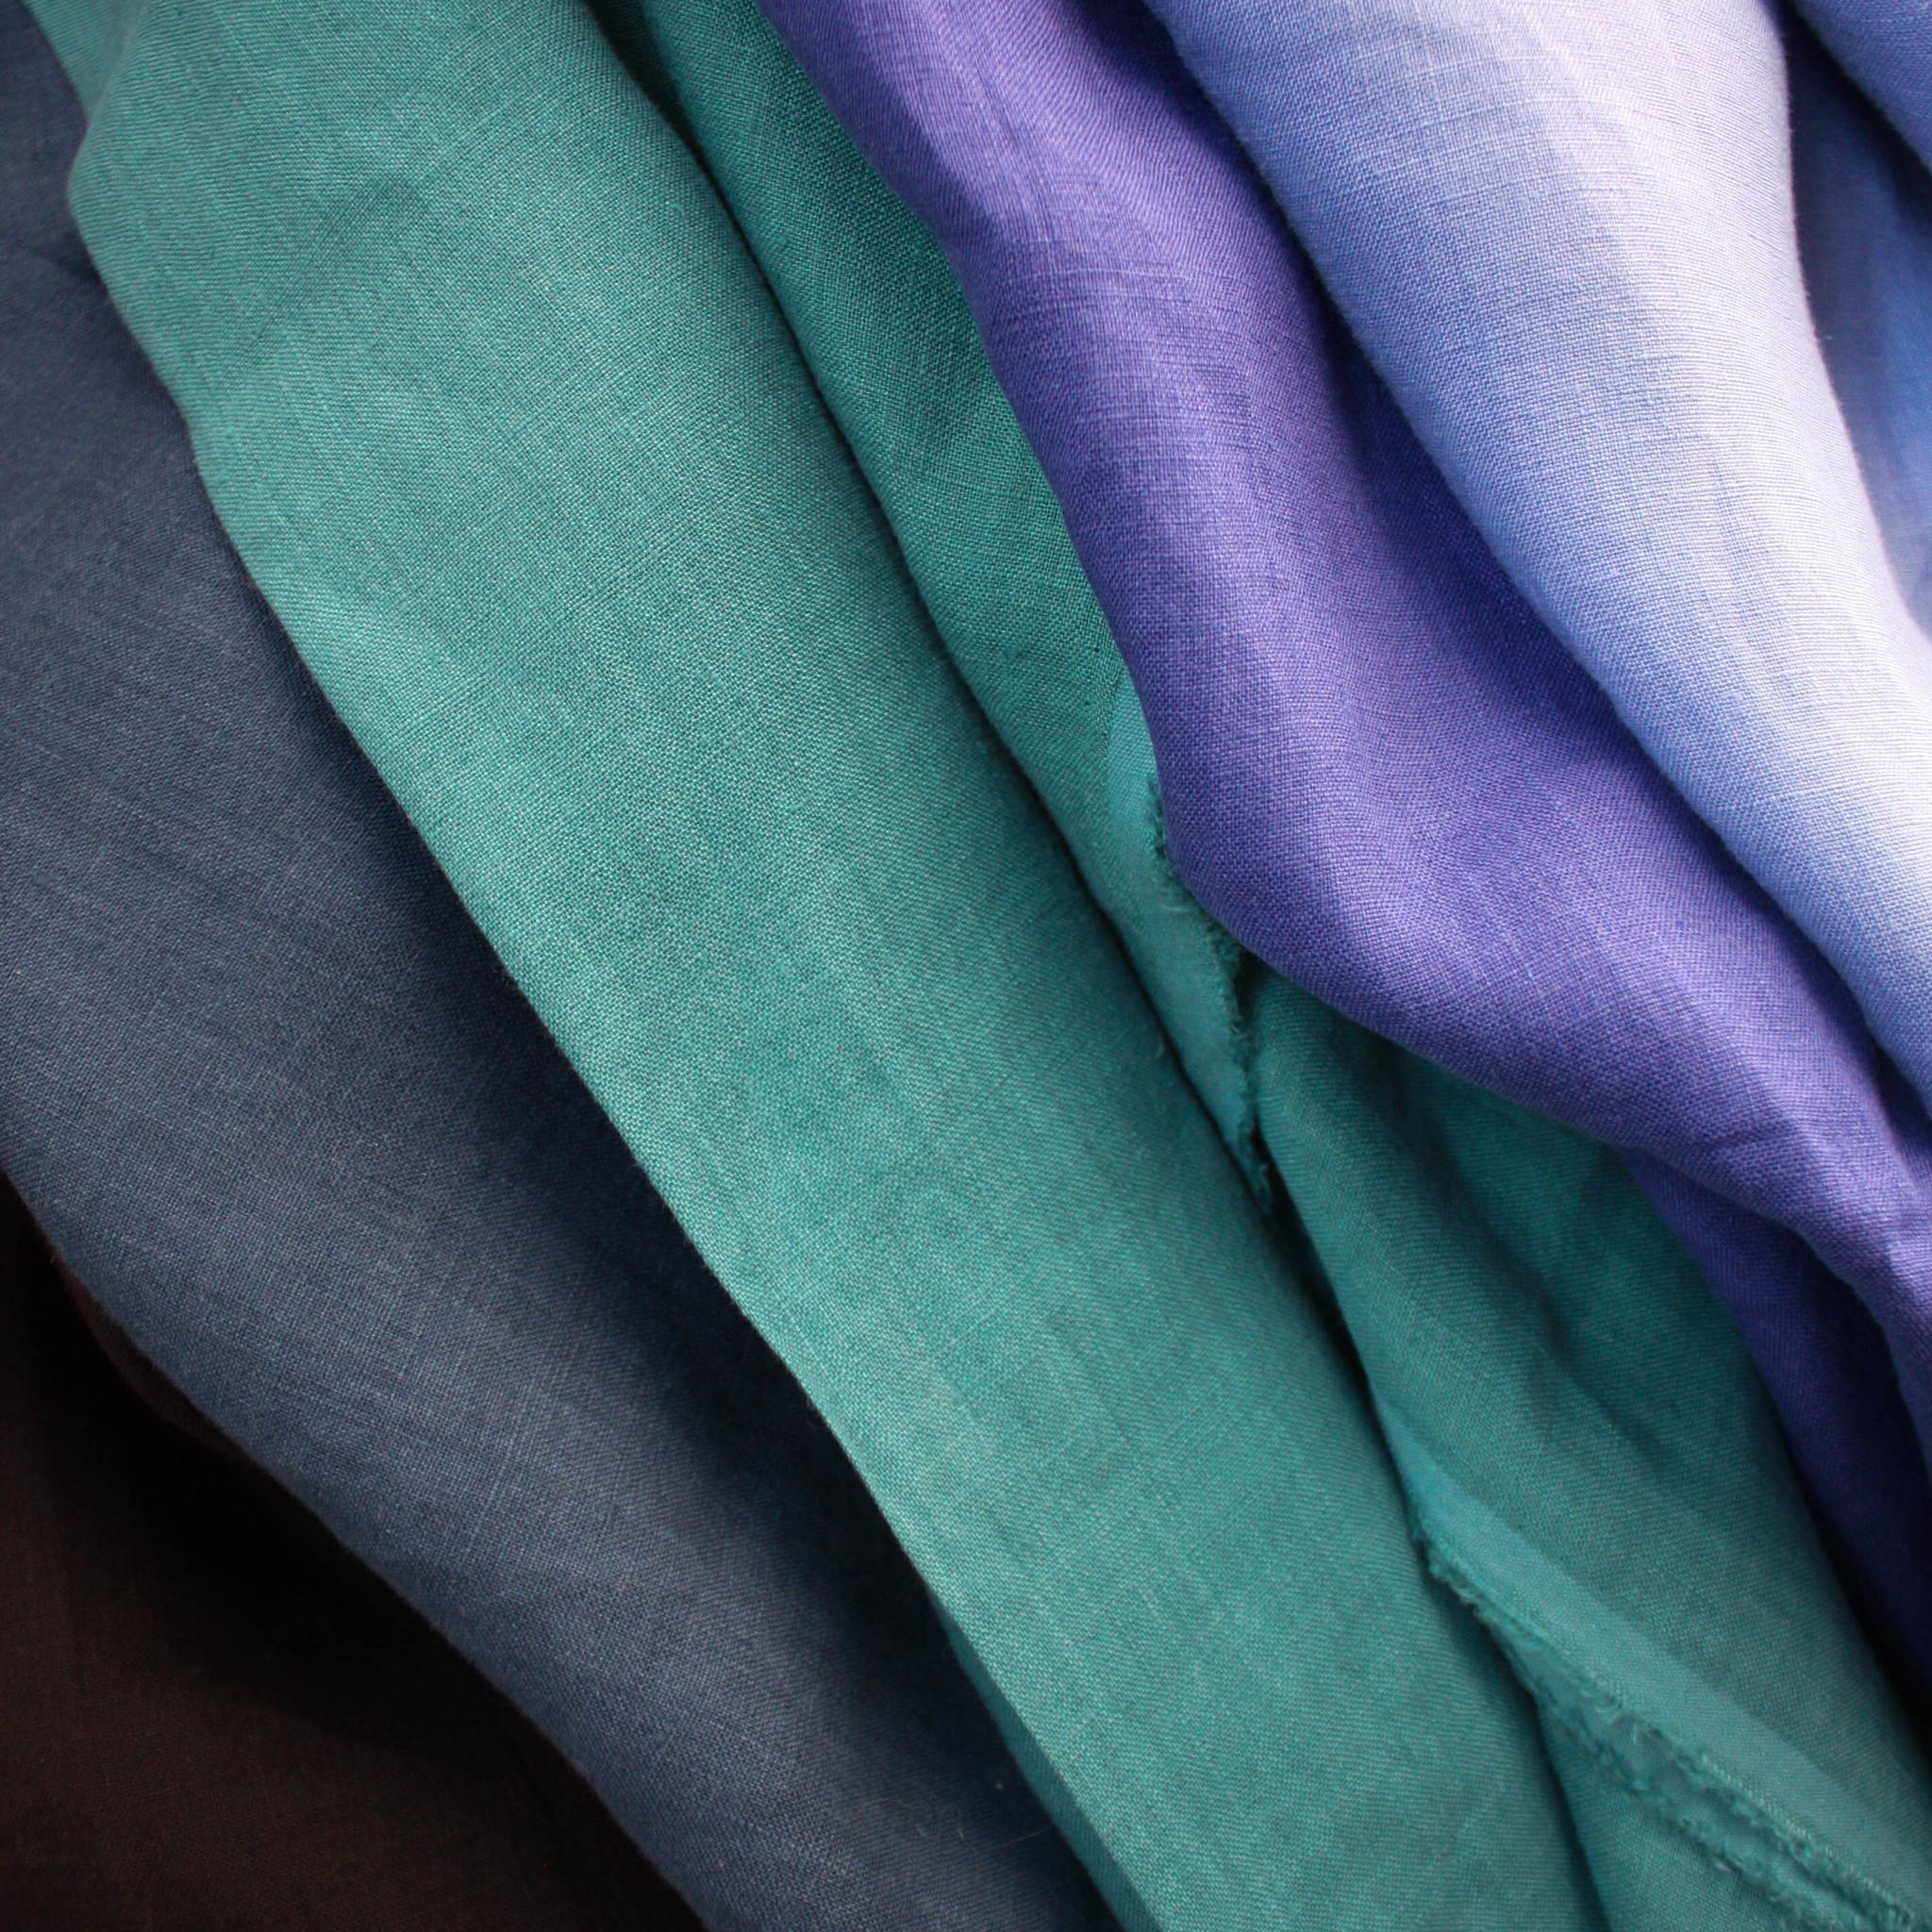 Nani Iro Nani Iro Turquoise Linen Sheeting